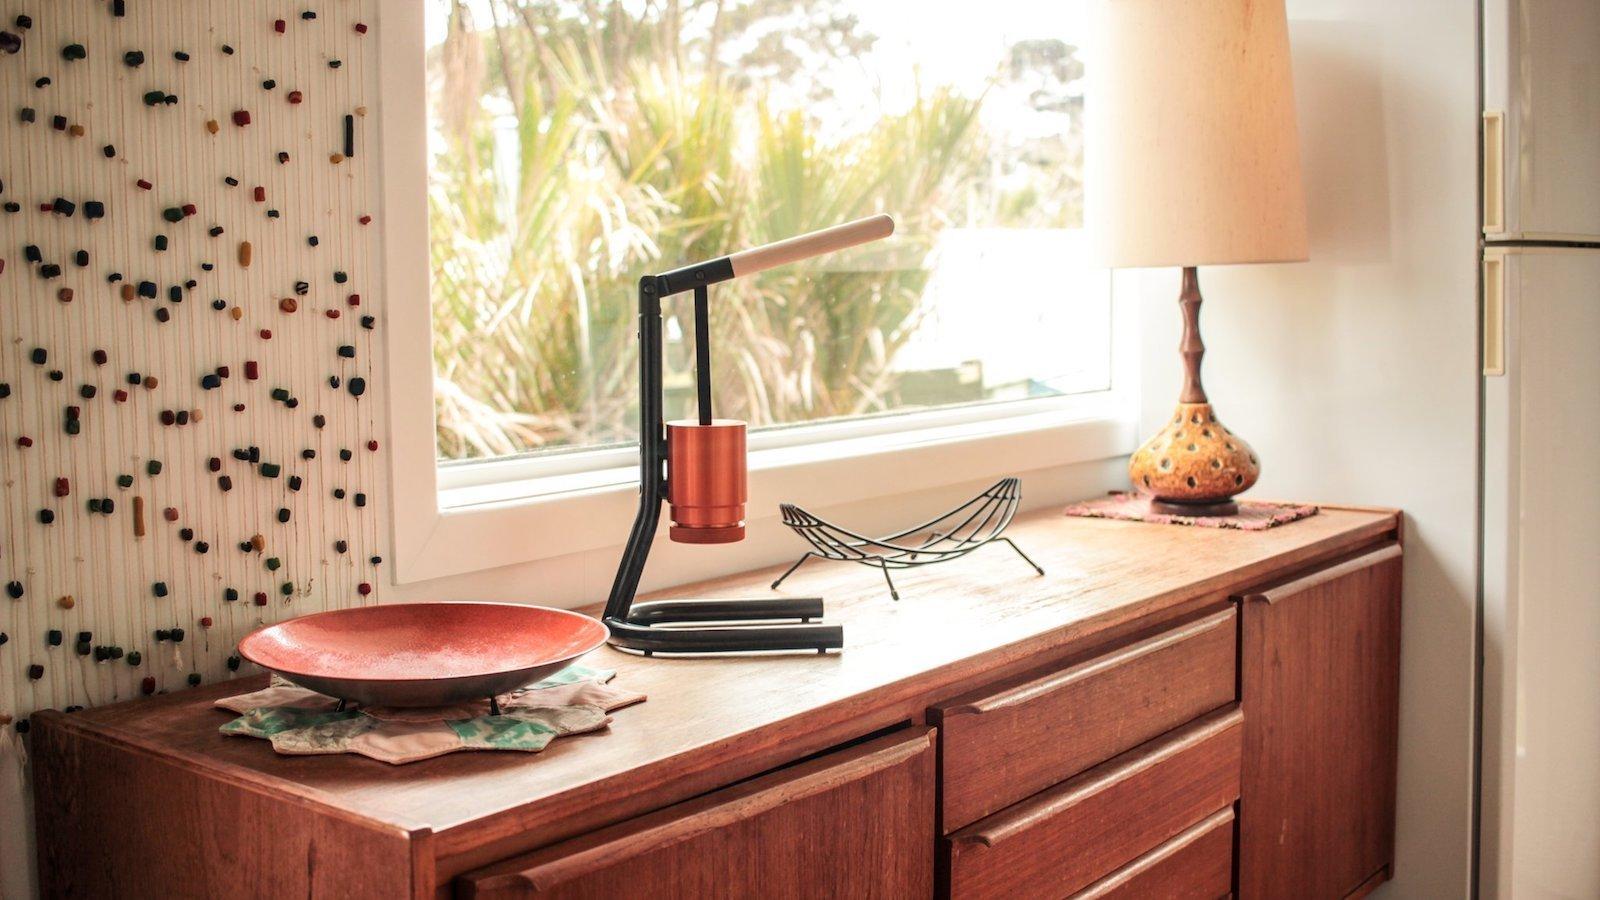 Newton Brua home espresso maker holds 15–17g of fine grind to create a smooth crema